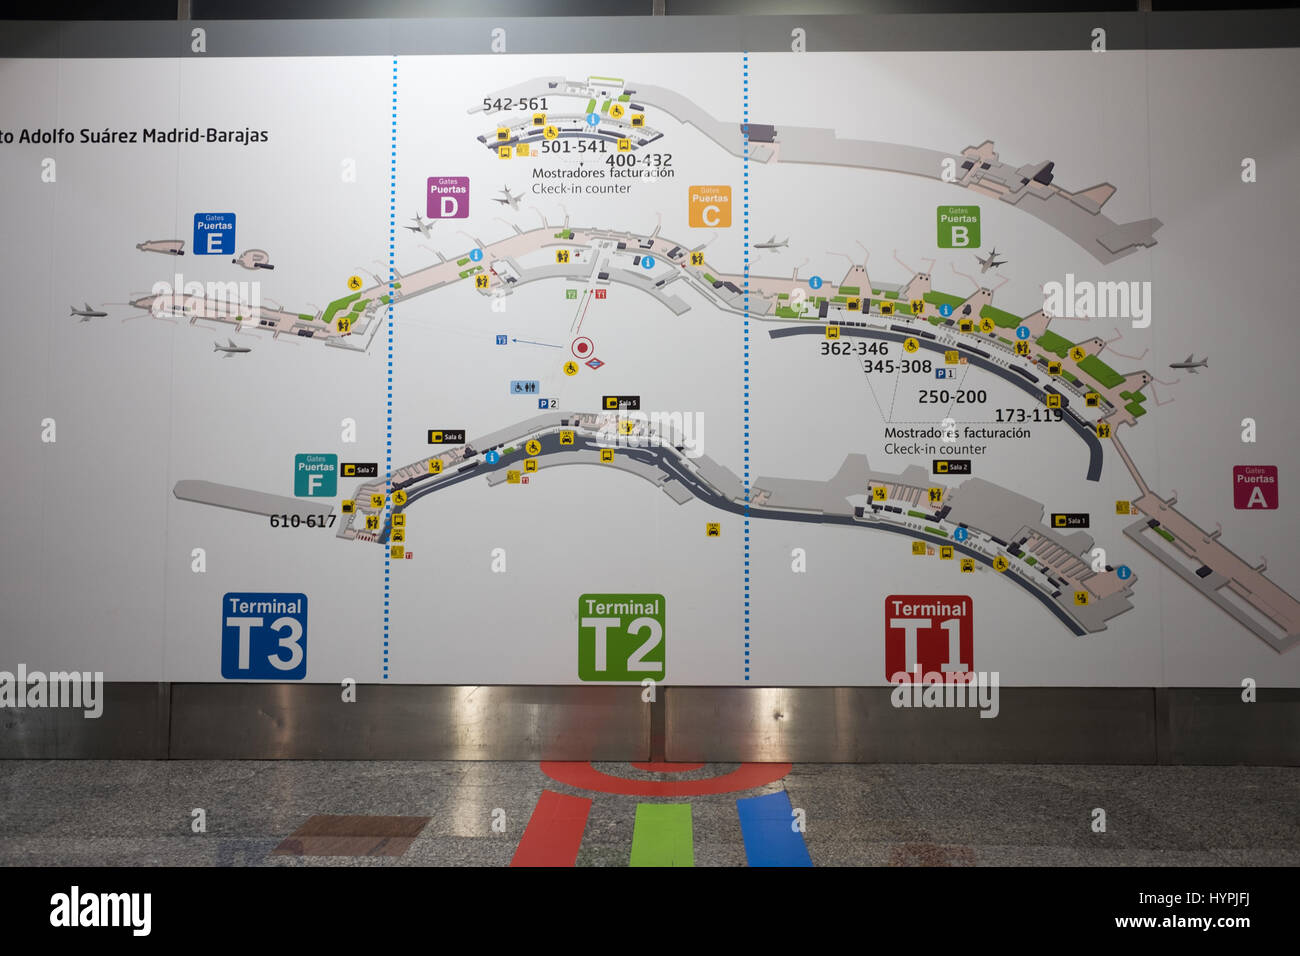 Mapa Aeropuerto Barajas T4.Information T4 Barajas Imagenes De Stock Information T4